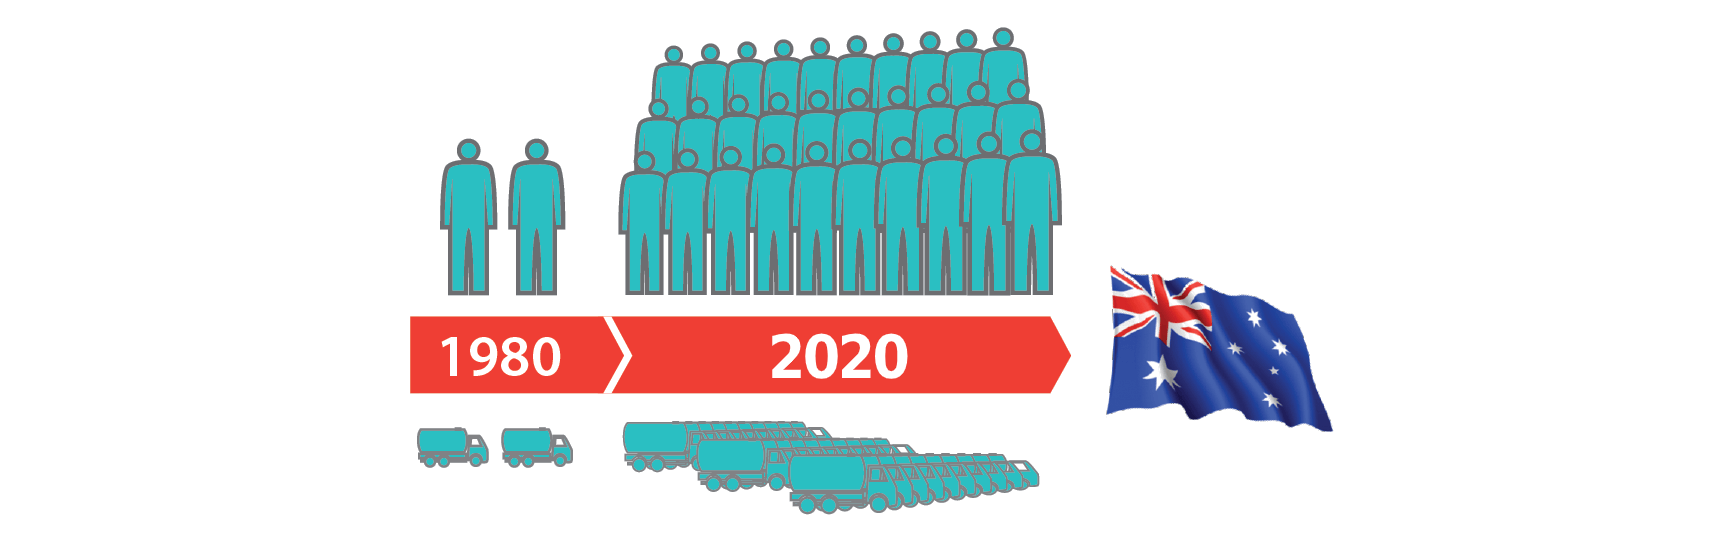 History Infographic-2 2020